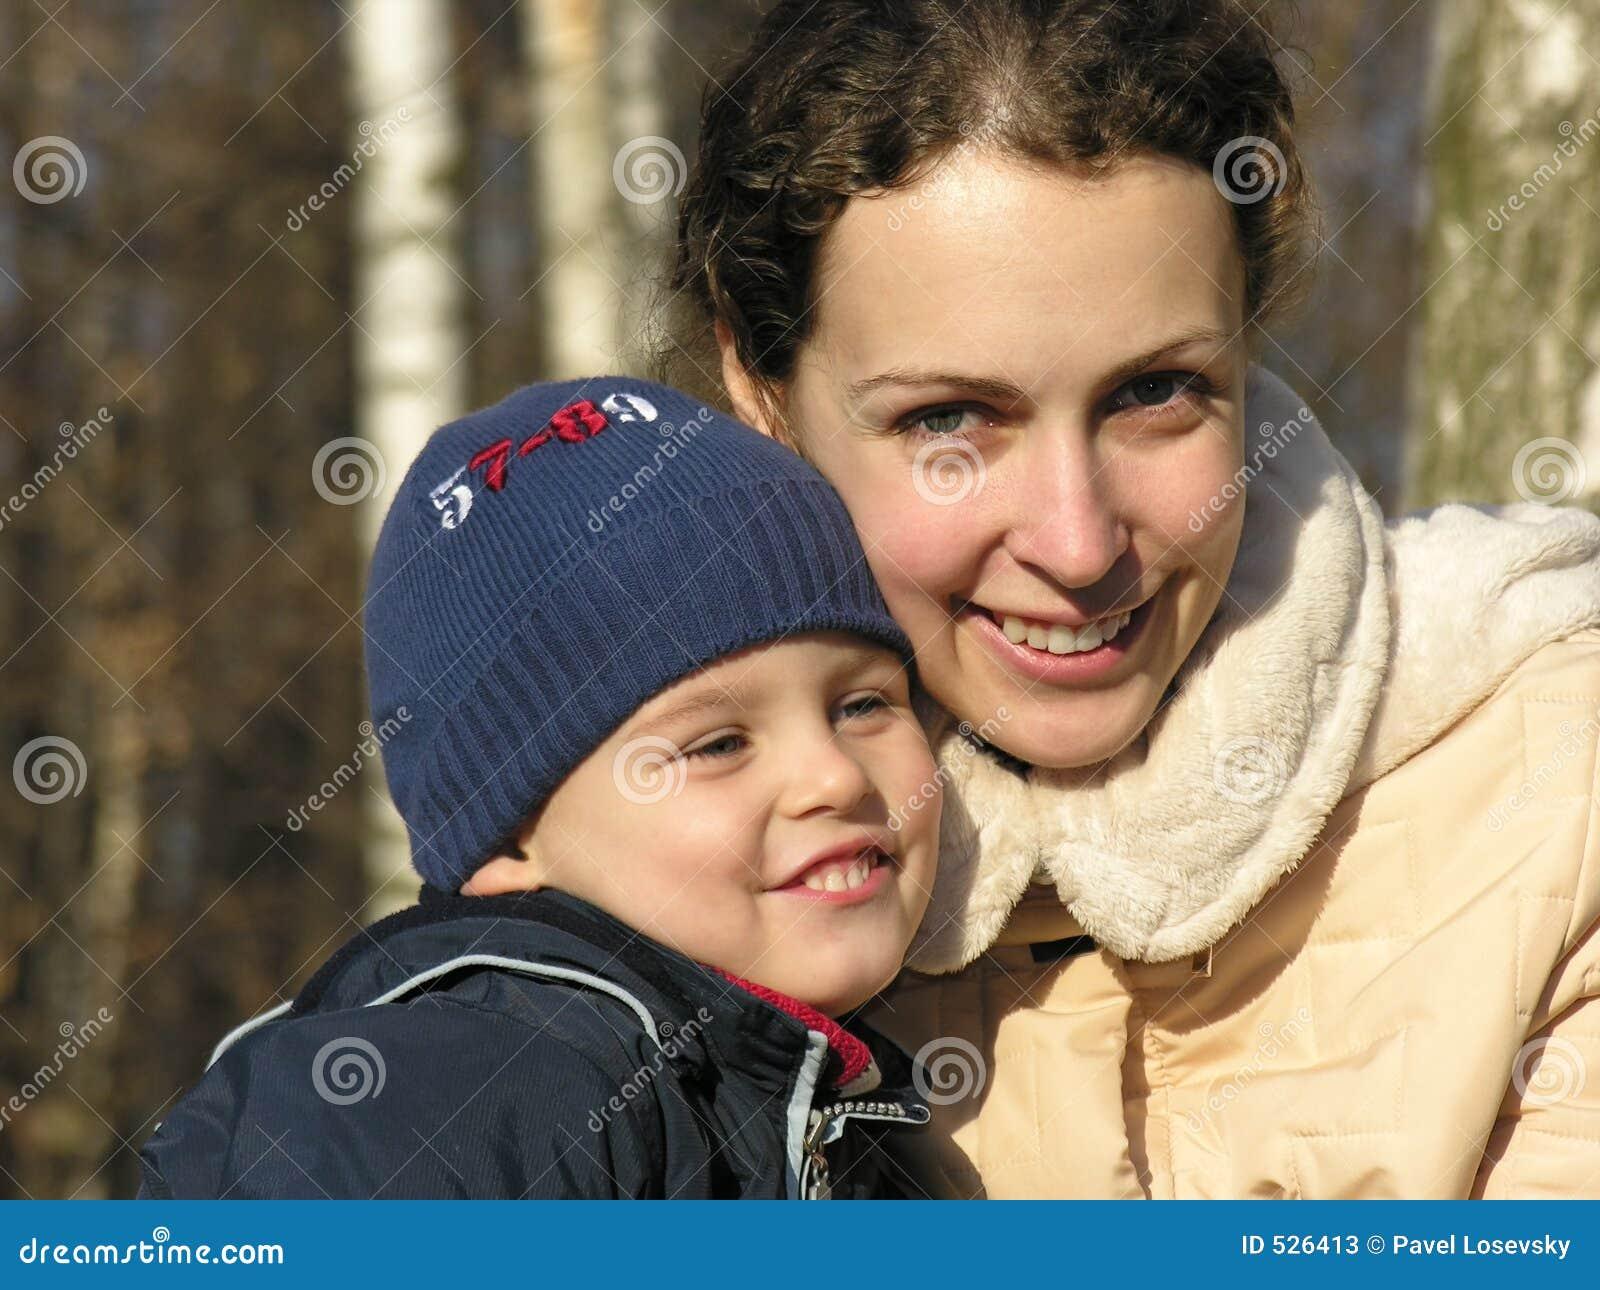 Download 表面母亲儿子 库存图片. 图片 包括有 荣耀, 拥抱, 感觉, 成人, 基督教, 心情, 逗人喜爱, 背包, 自治权 - 526413